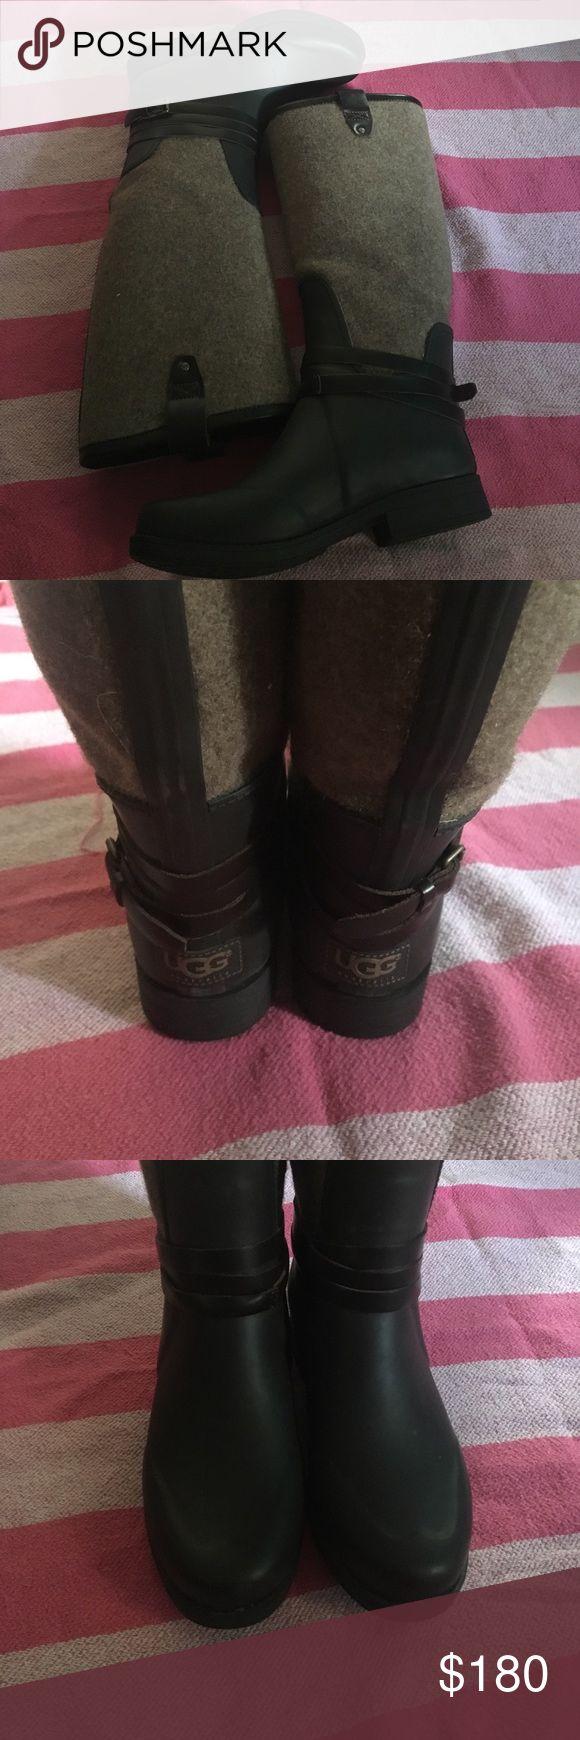 Ugg Rainboots Australian UGG winter rainboot with lamb fur on the sole. Slightly worn good condition. UGG Shoes Winter & Rain Boots